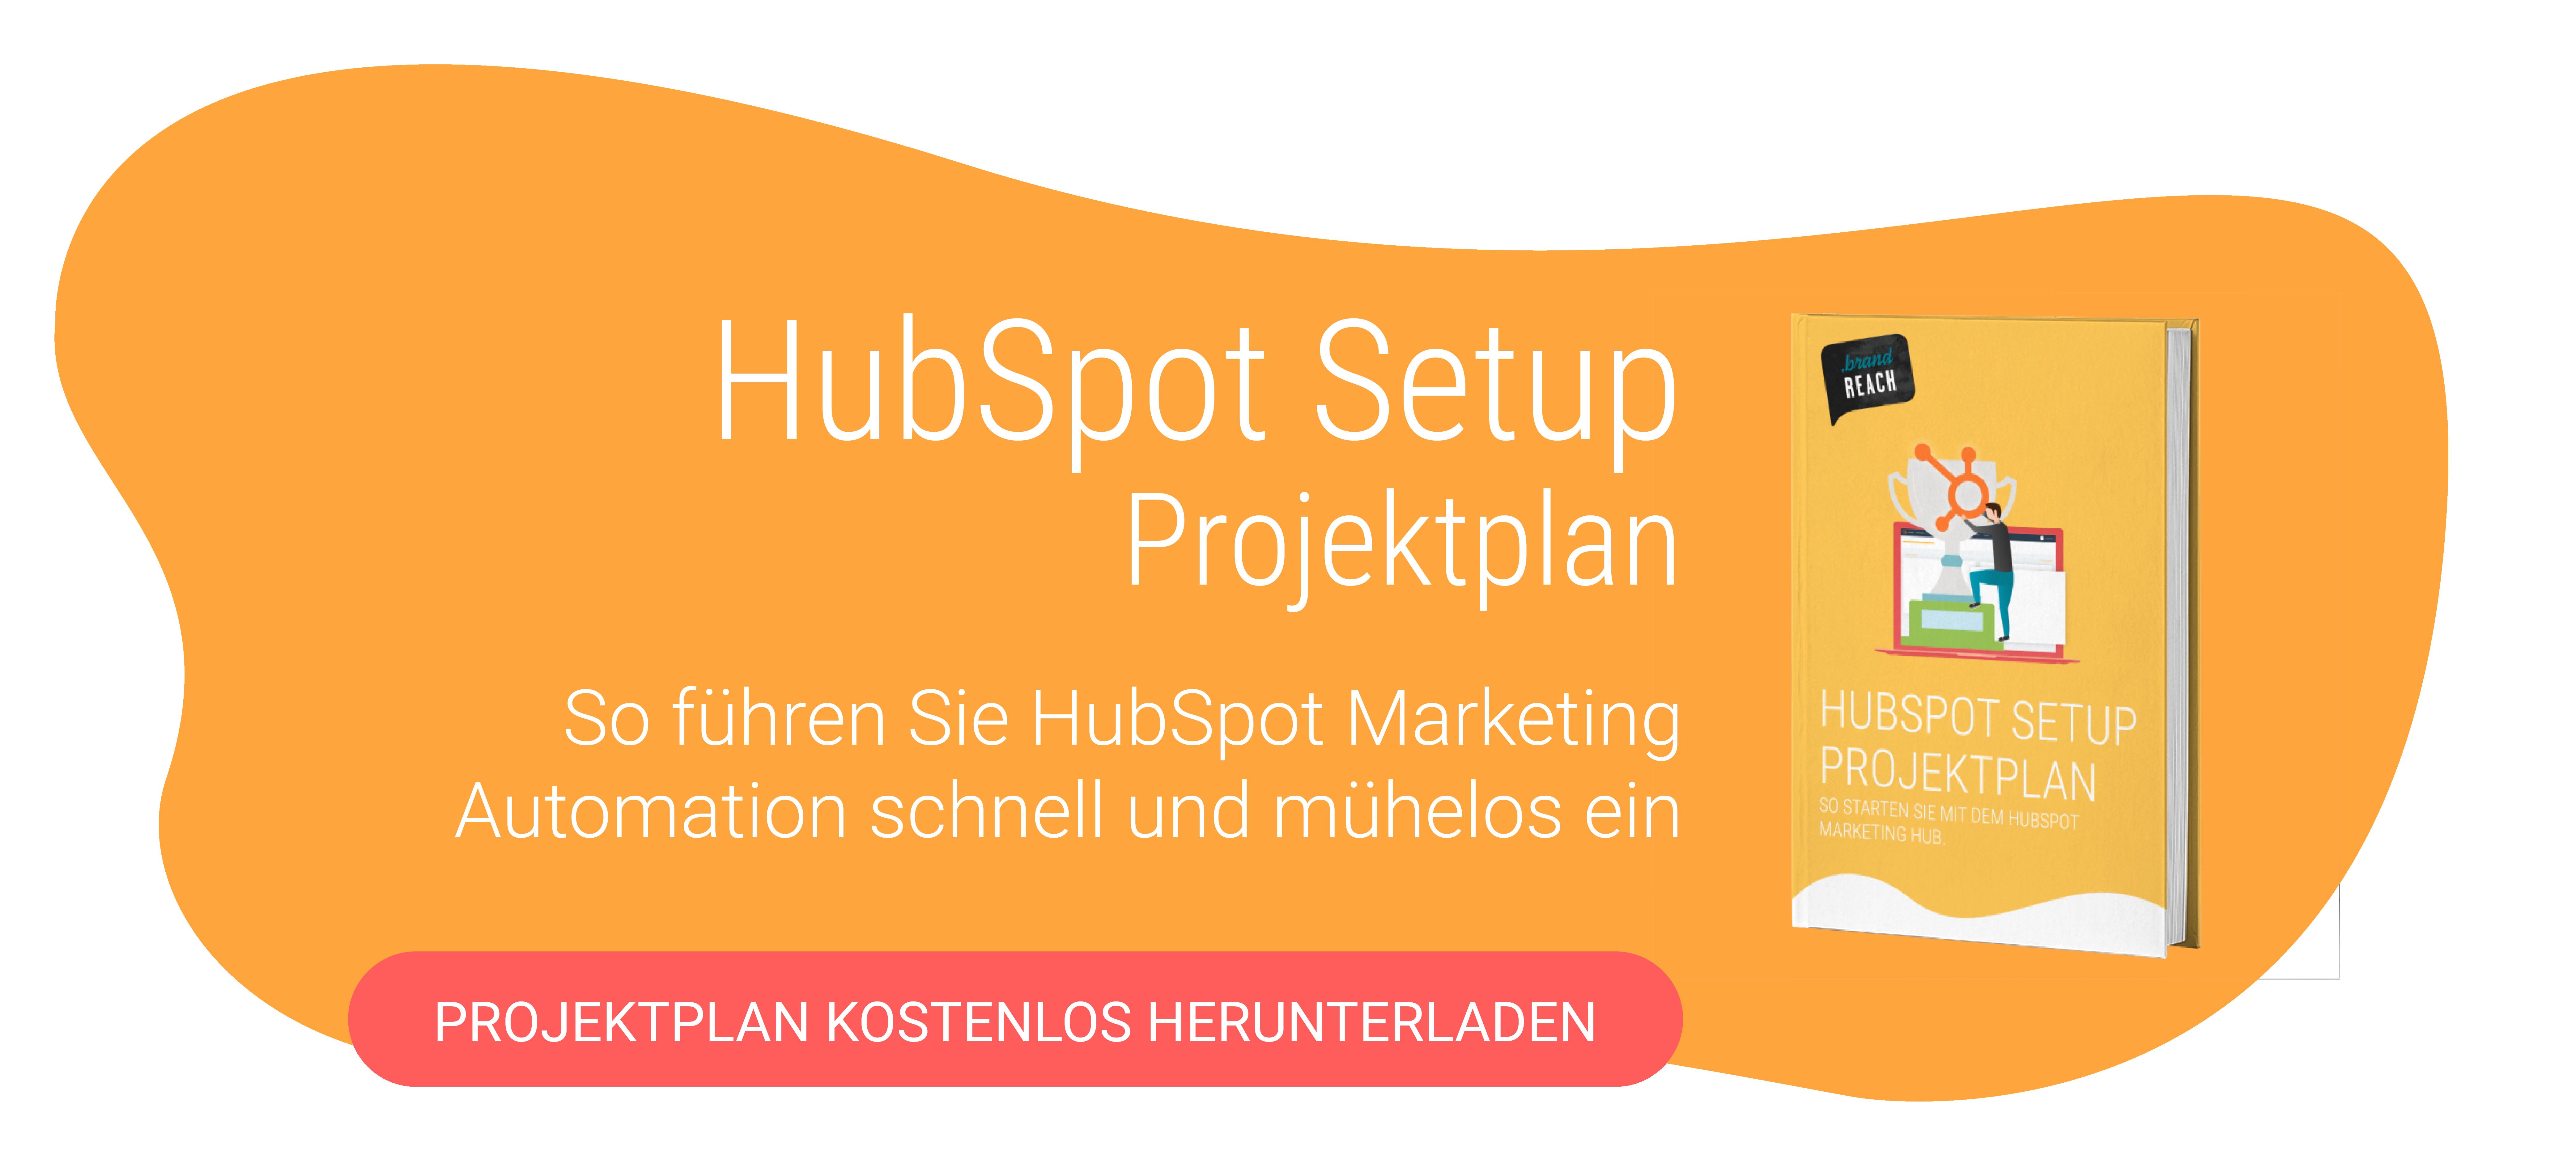 HubSpot Markting Hub Setup Projektplan Download